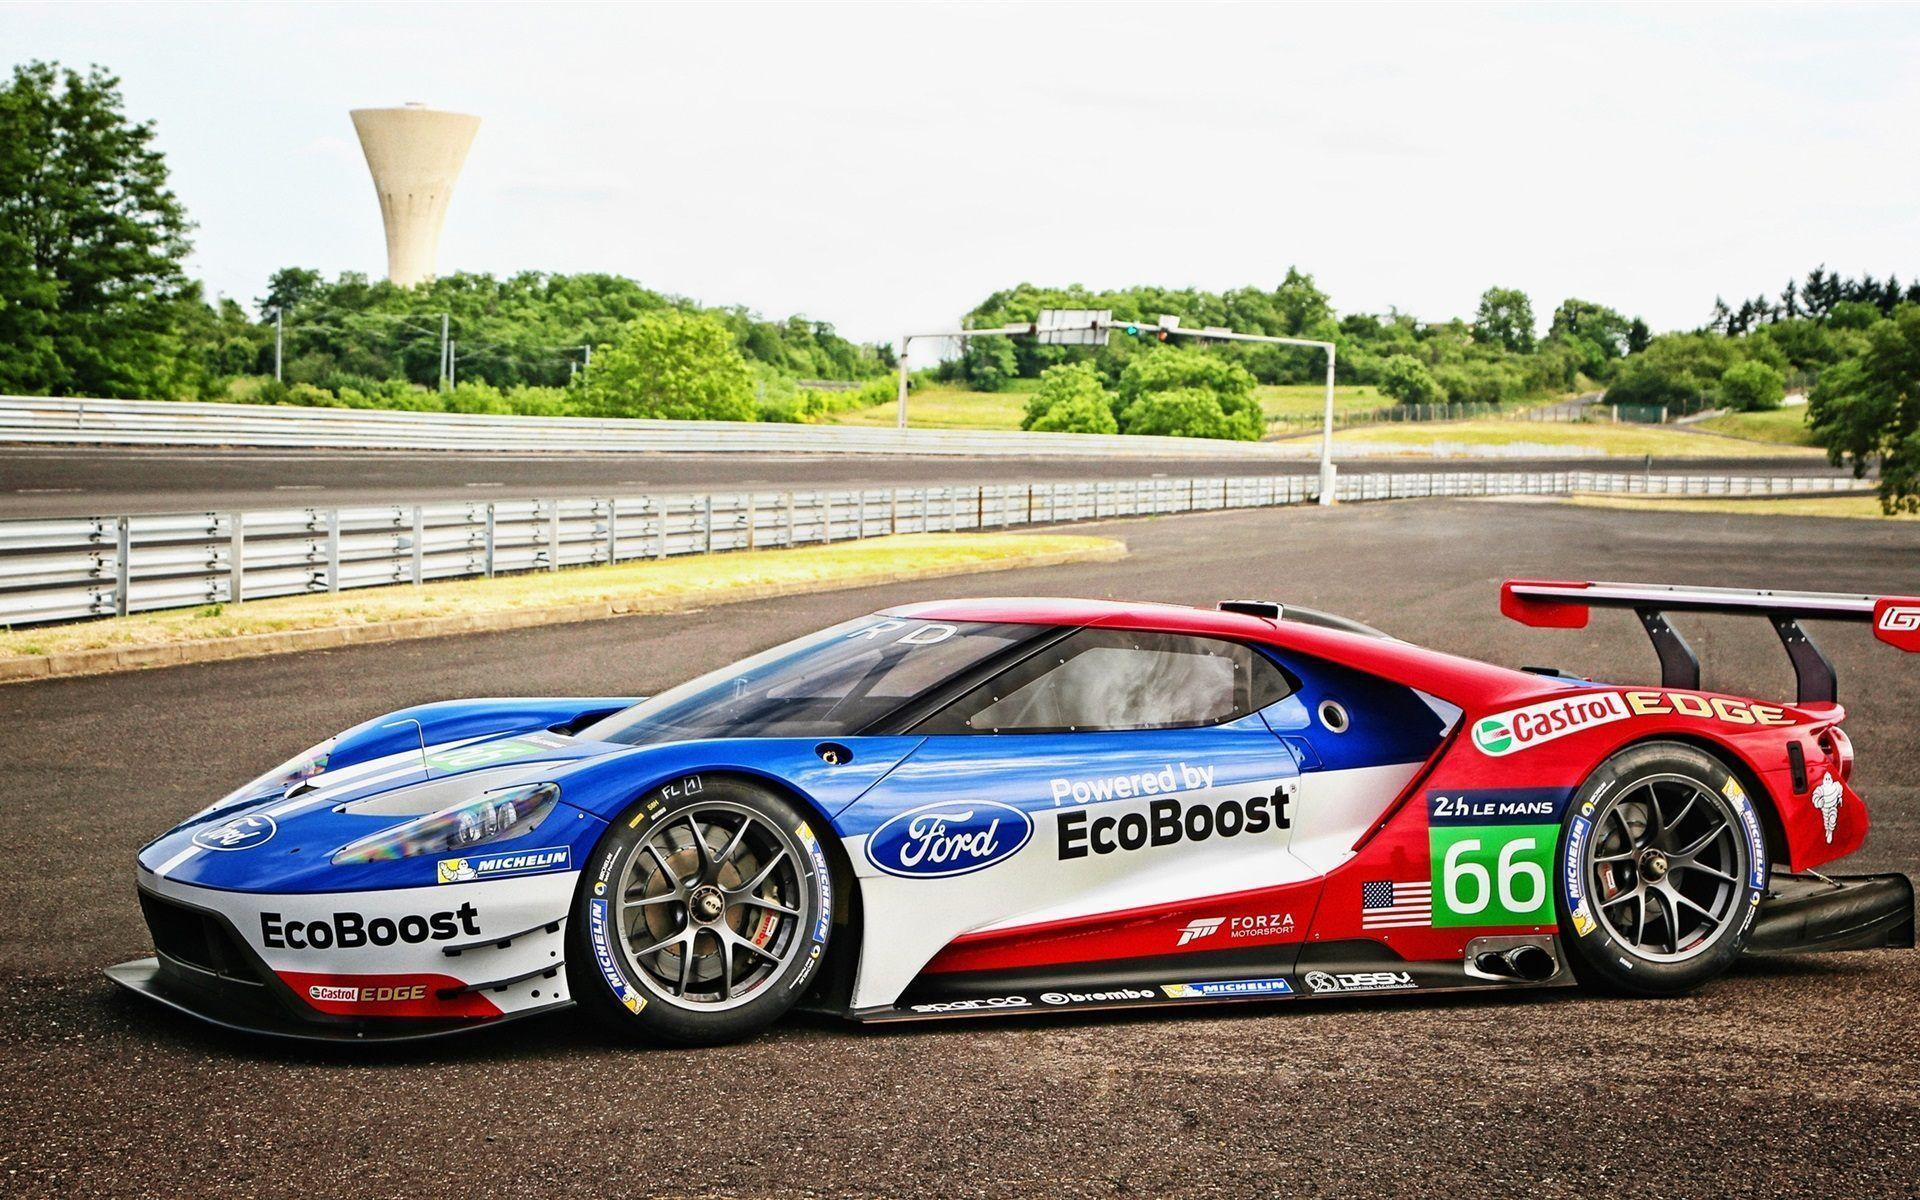 Ford GT Le Mans Race Car Wallpaper For Desktop & Mobile